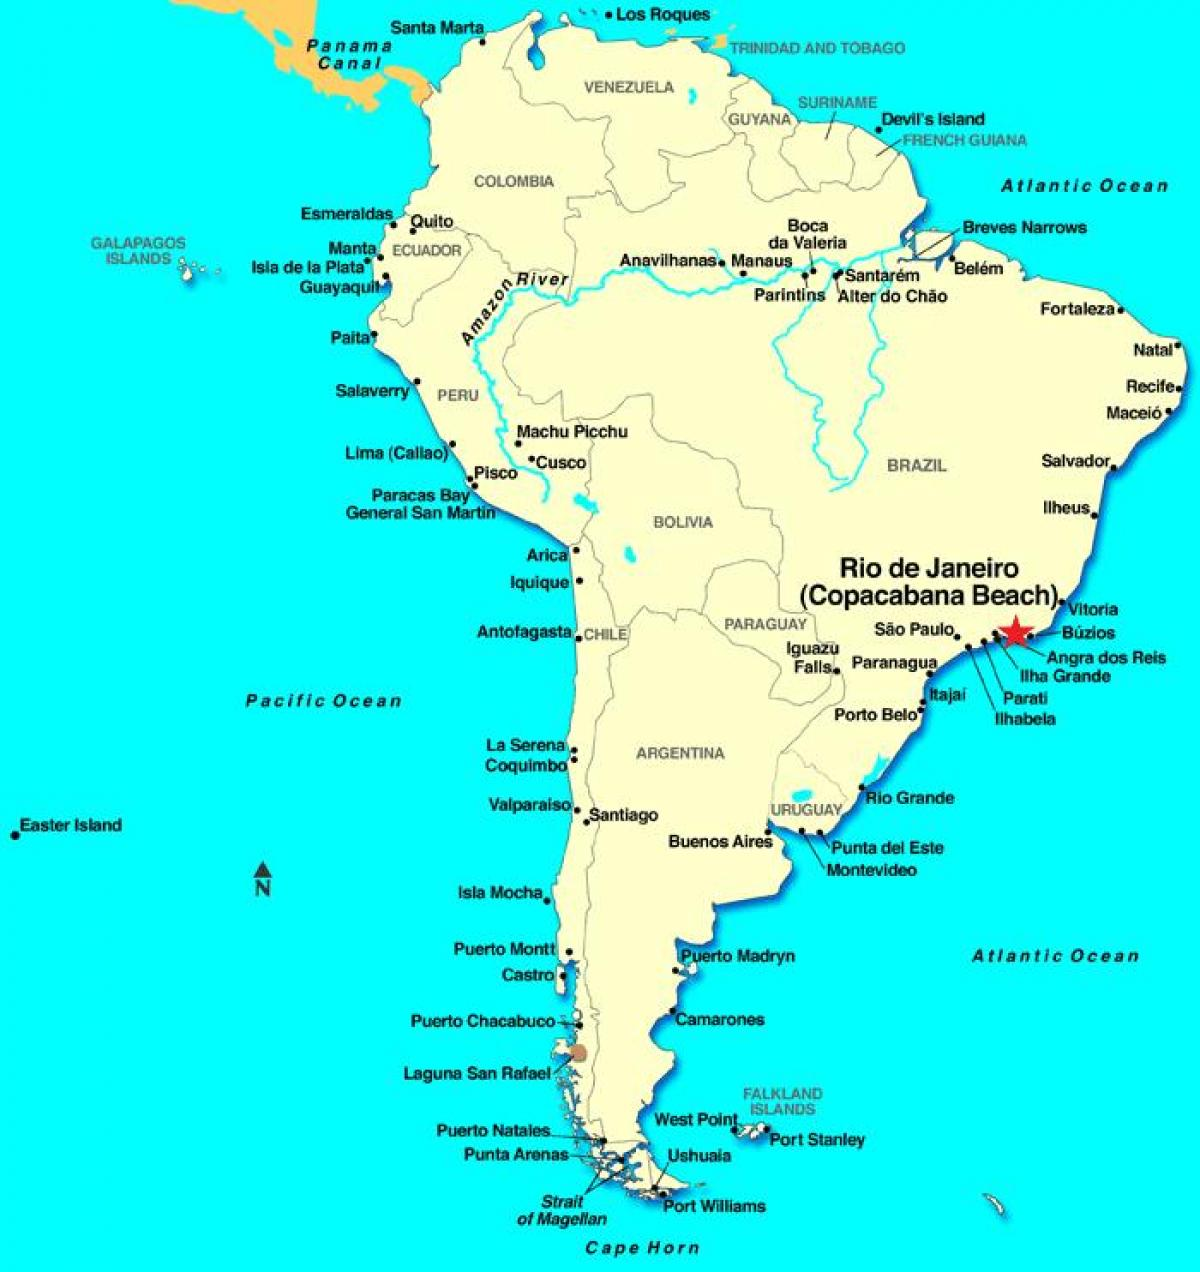 Rio De Janeiro In South America Map Map Of Rio De Janeiro In - Rio de janeiro map